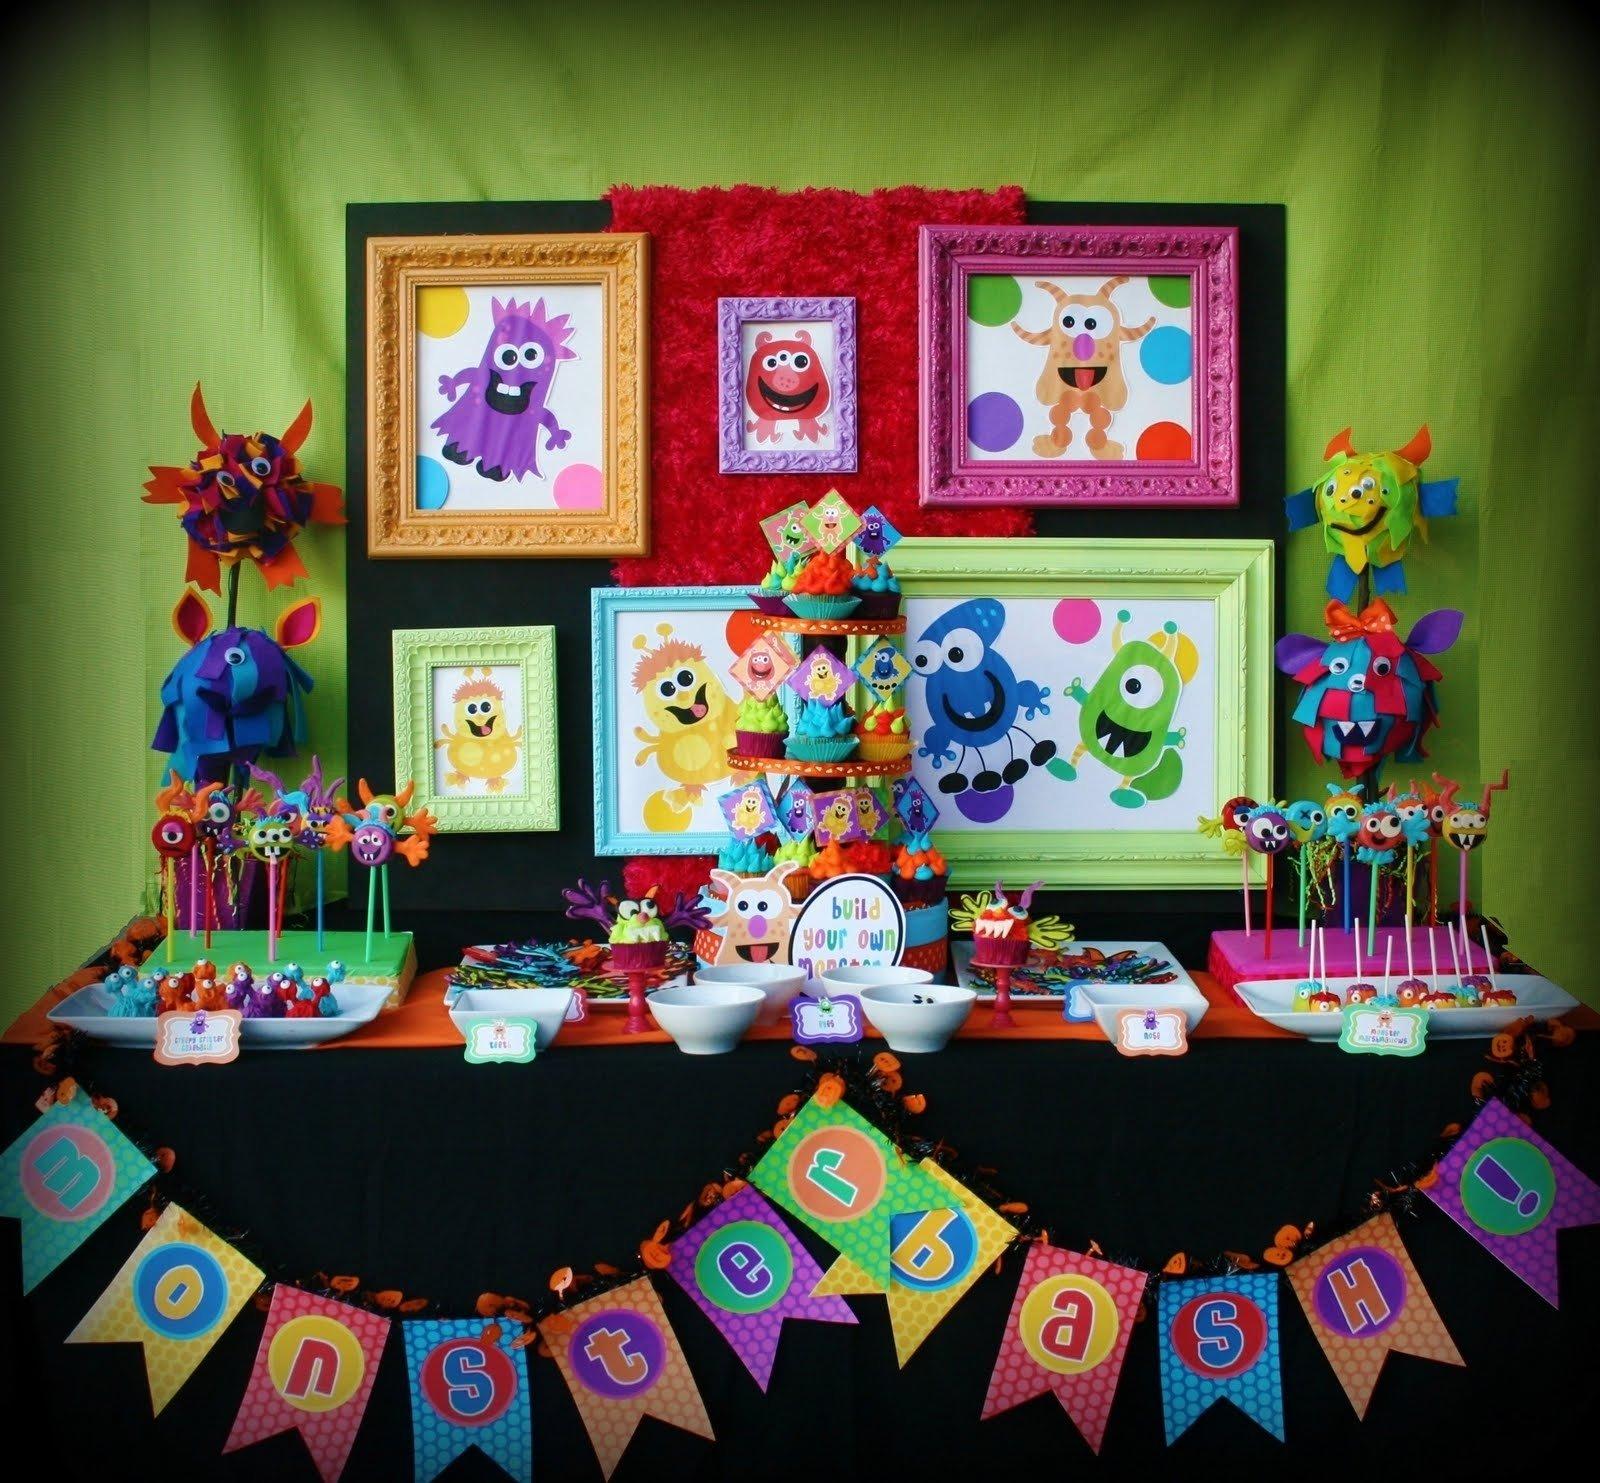 10 Unique Birthday Party Ideas For Boys Age 7 50 awesome boys birthday party ideas i heart naptime 53 2020